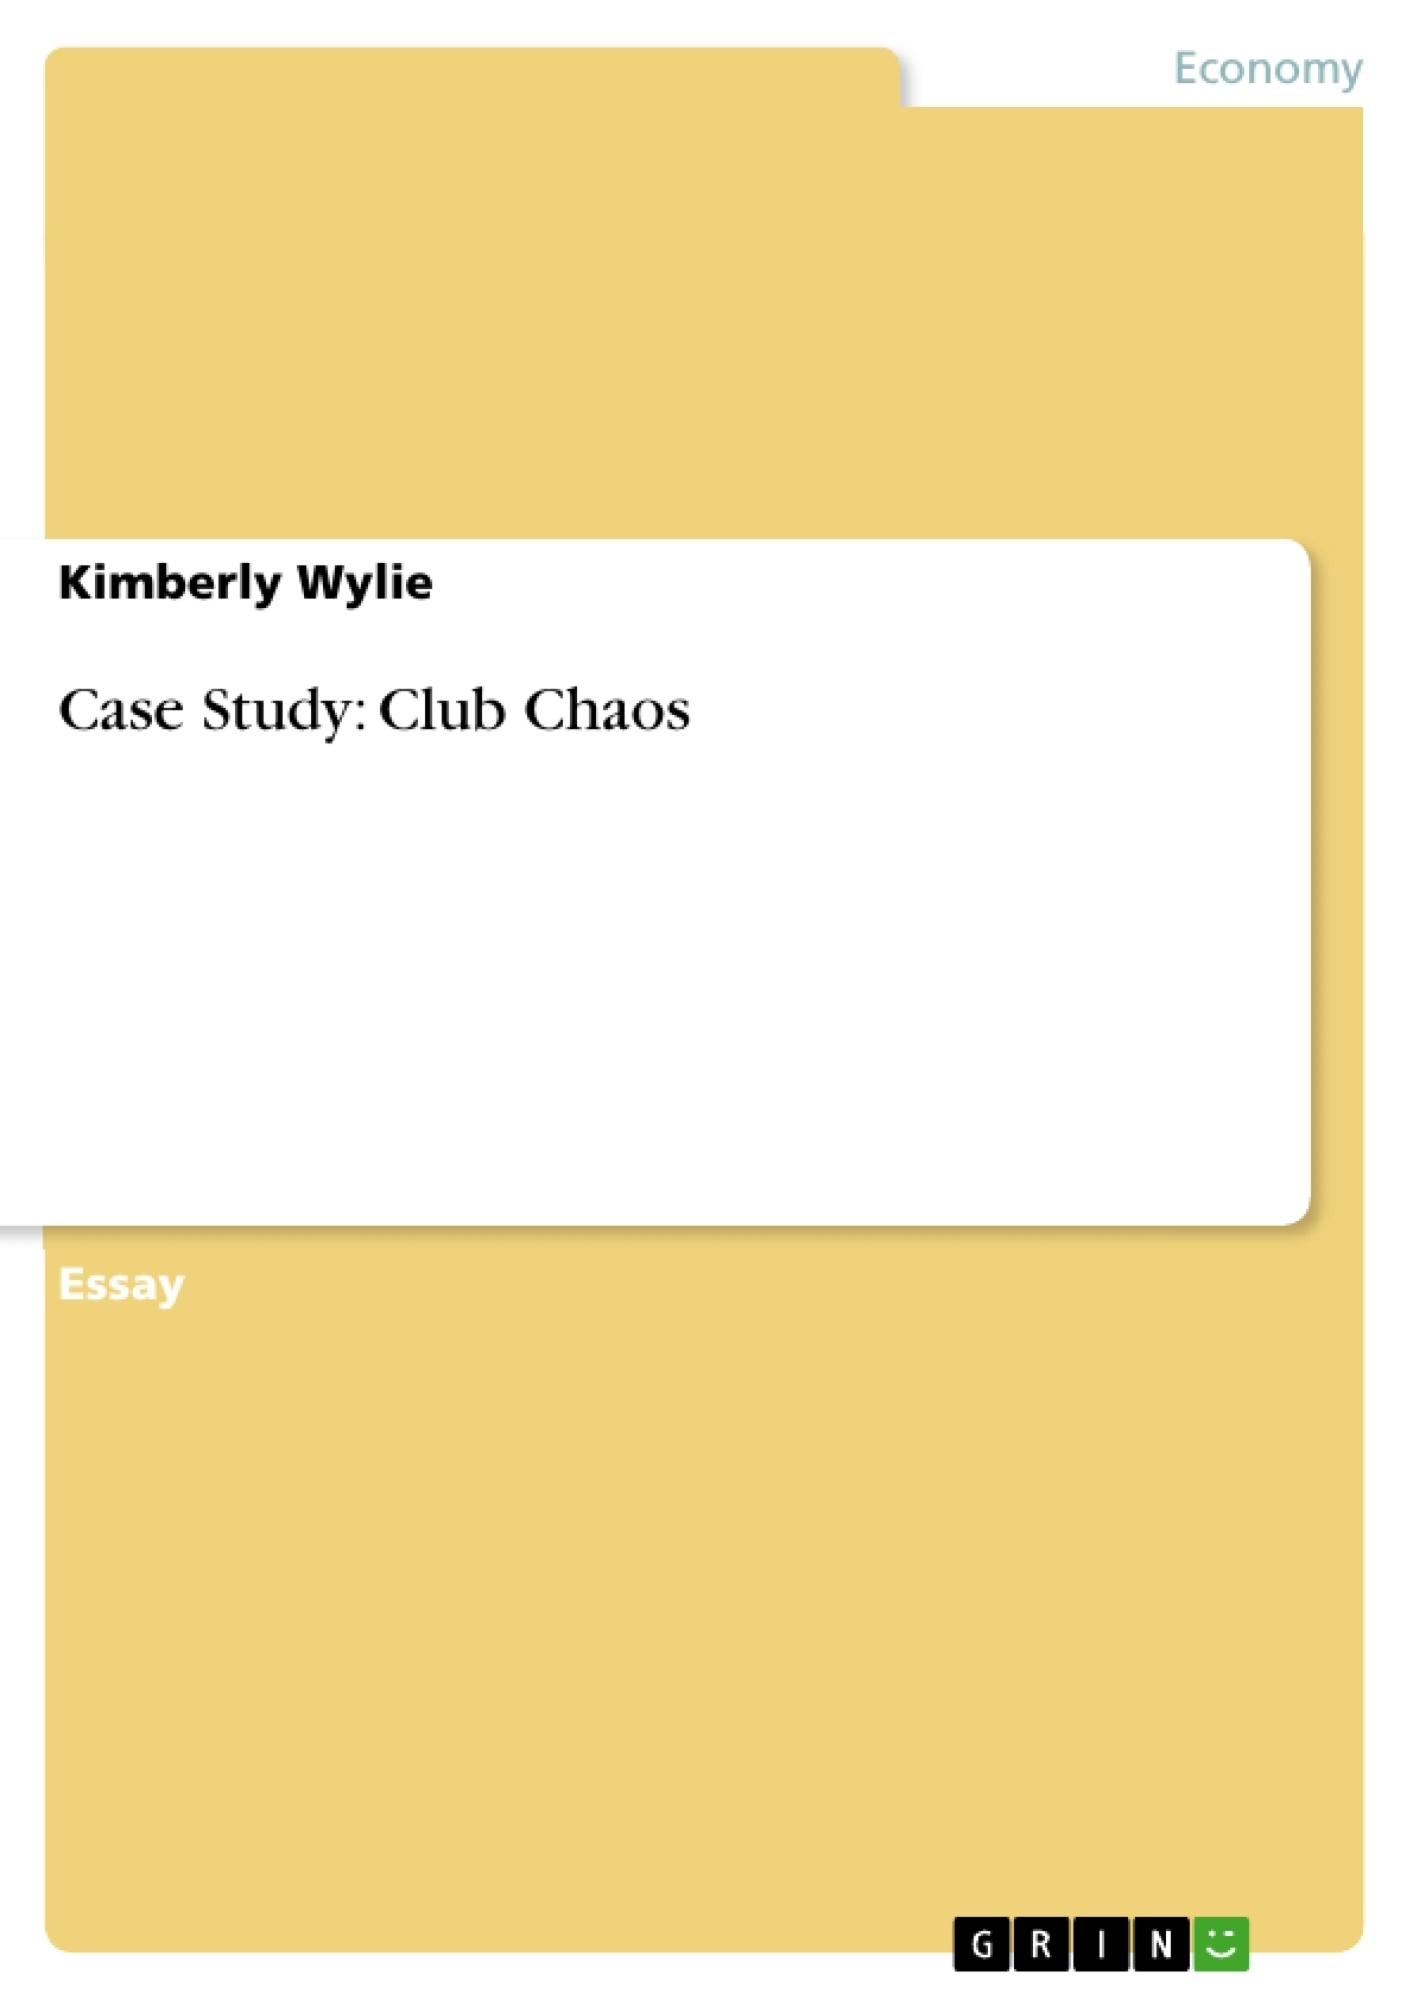 Title: Case Study: Club Chaos